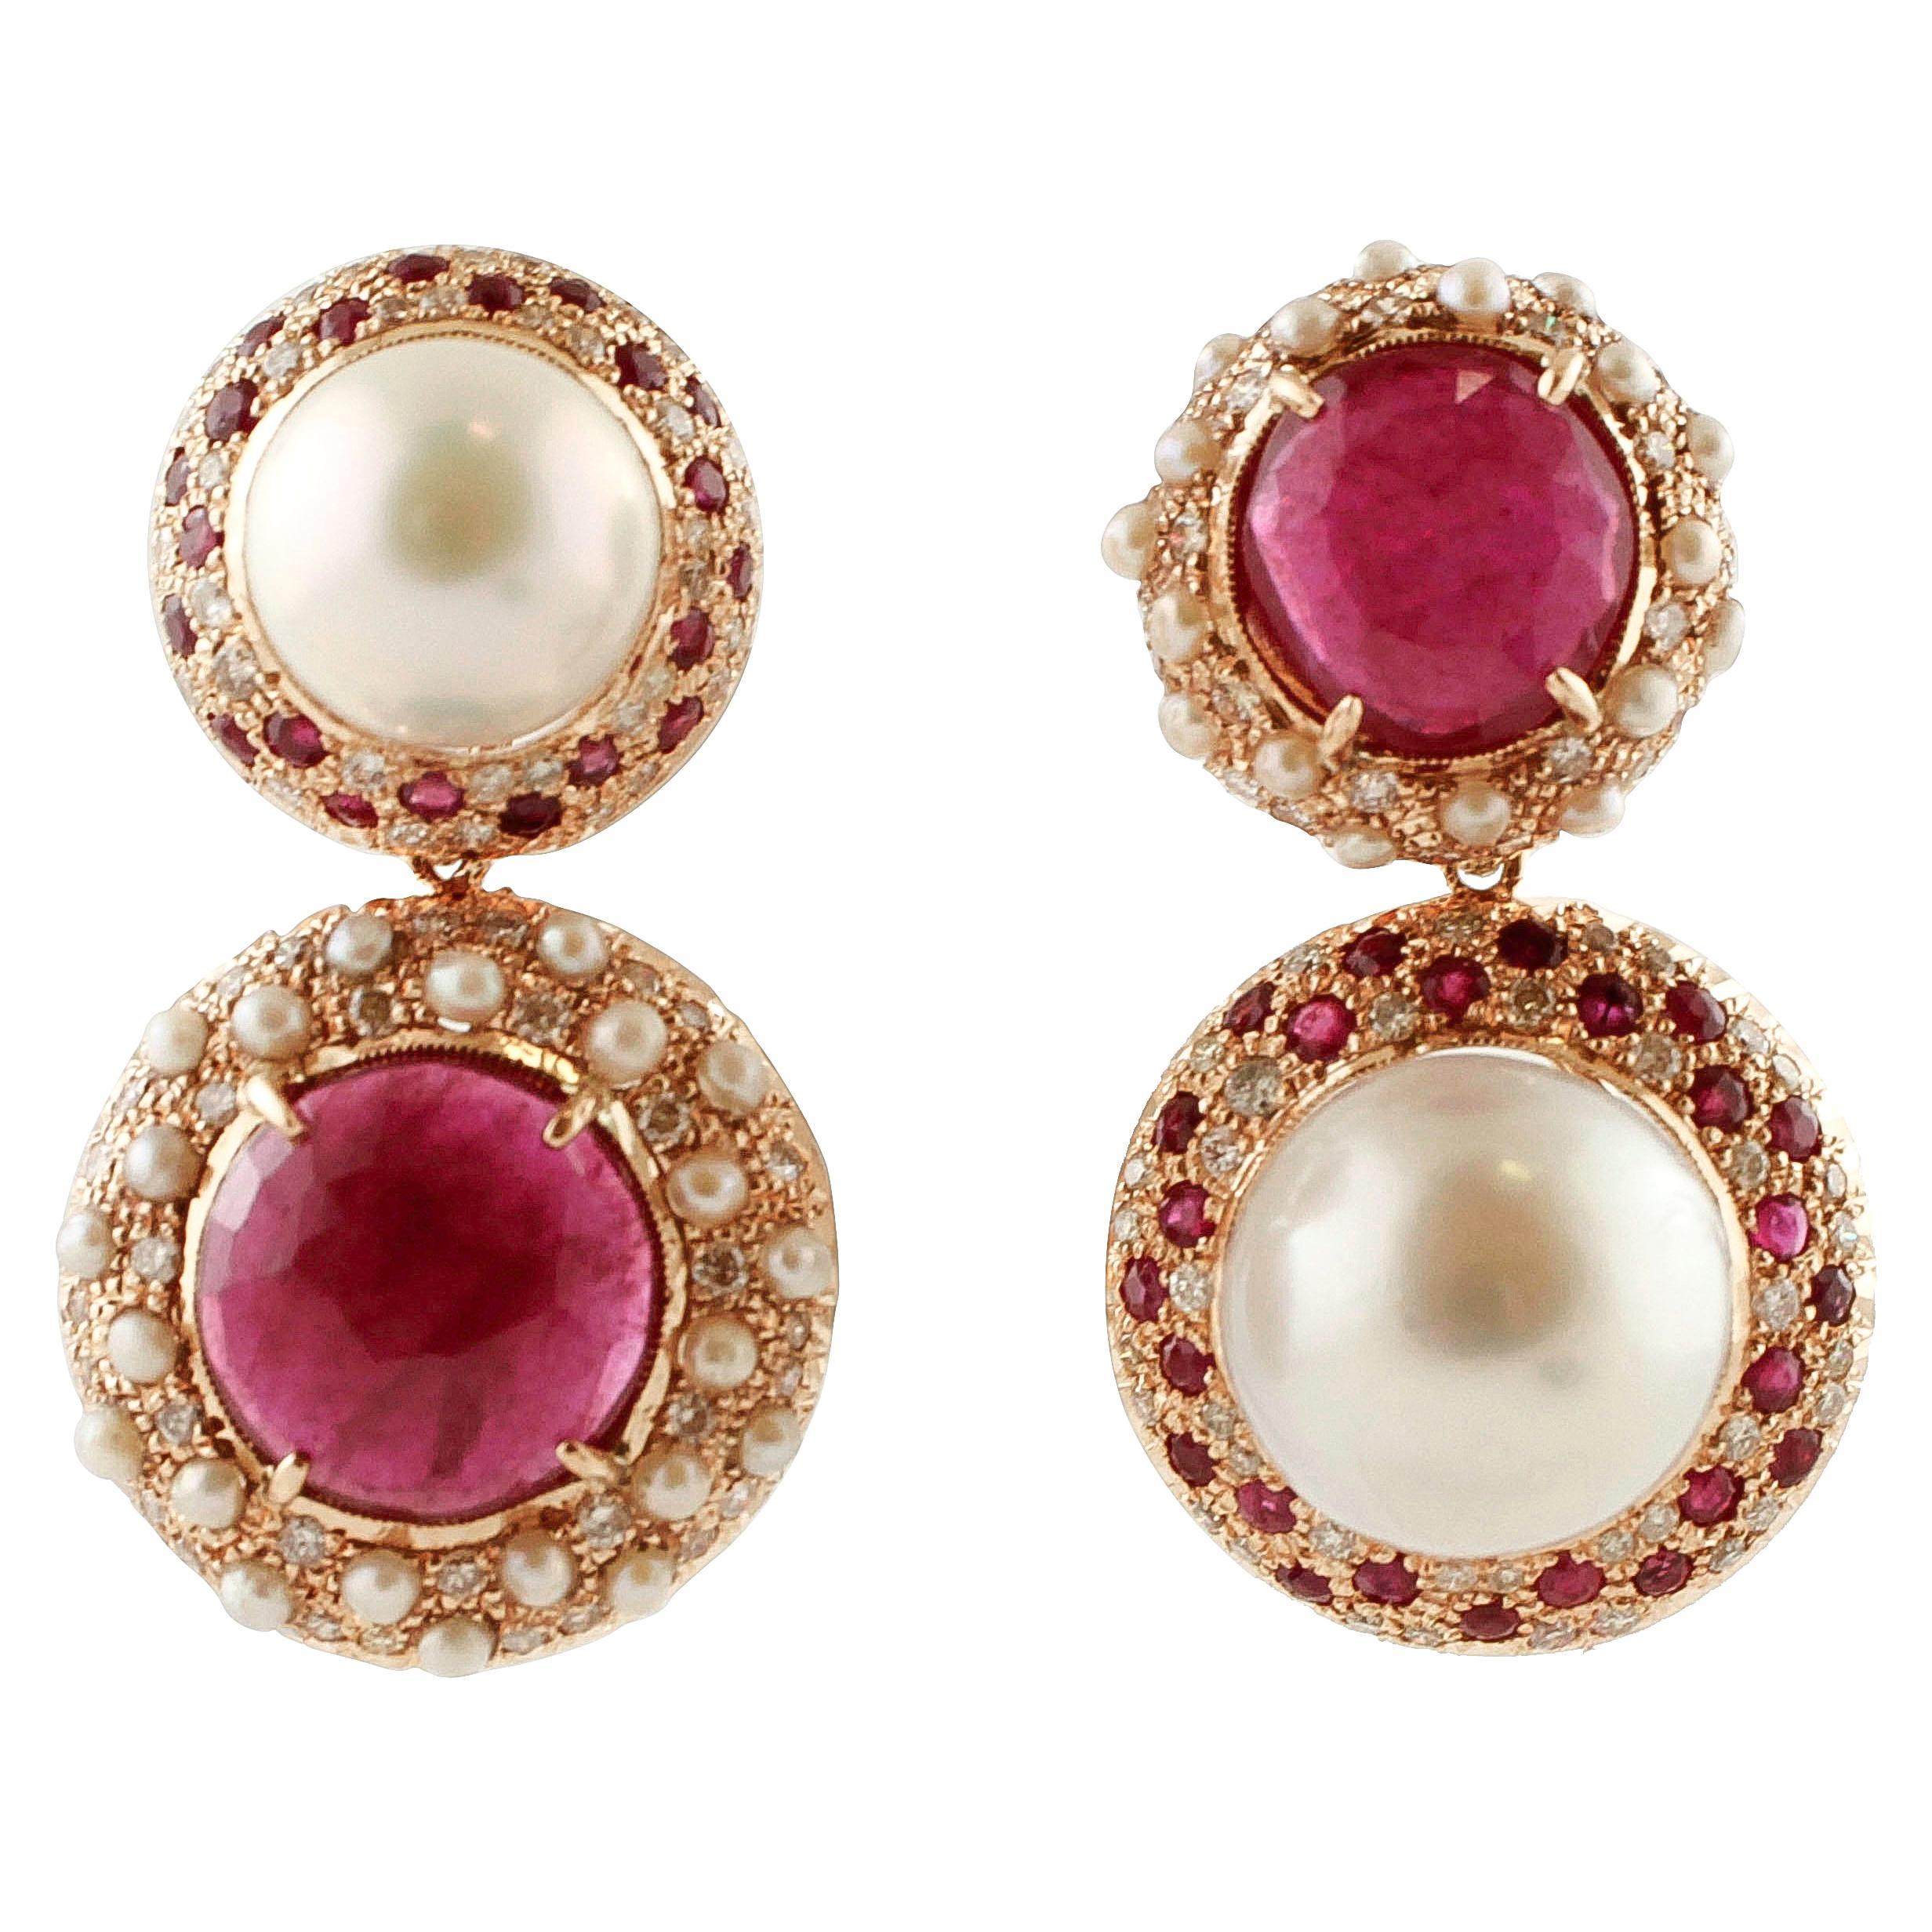 South Sea Pearls, Rubies, Diamonds, Rose Gold Retro Dangle Earrings